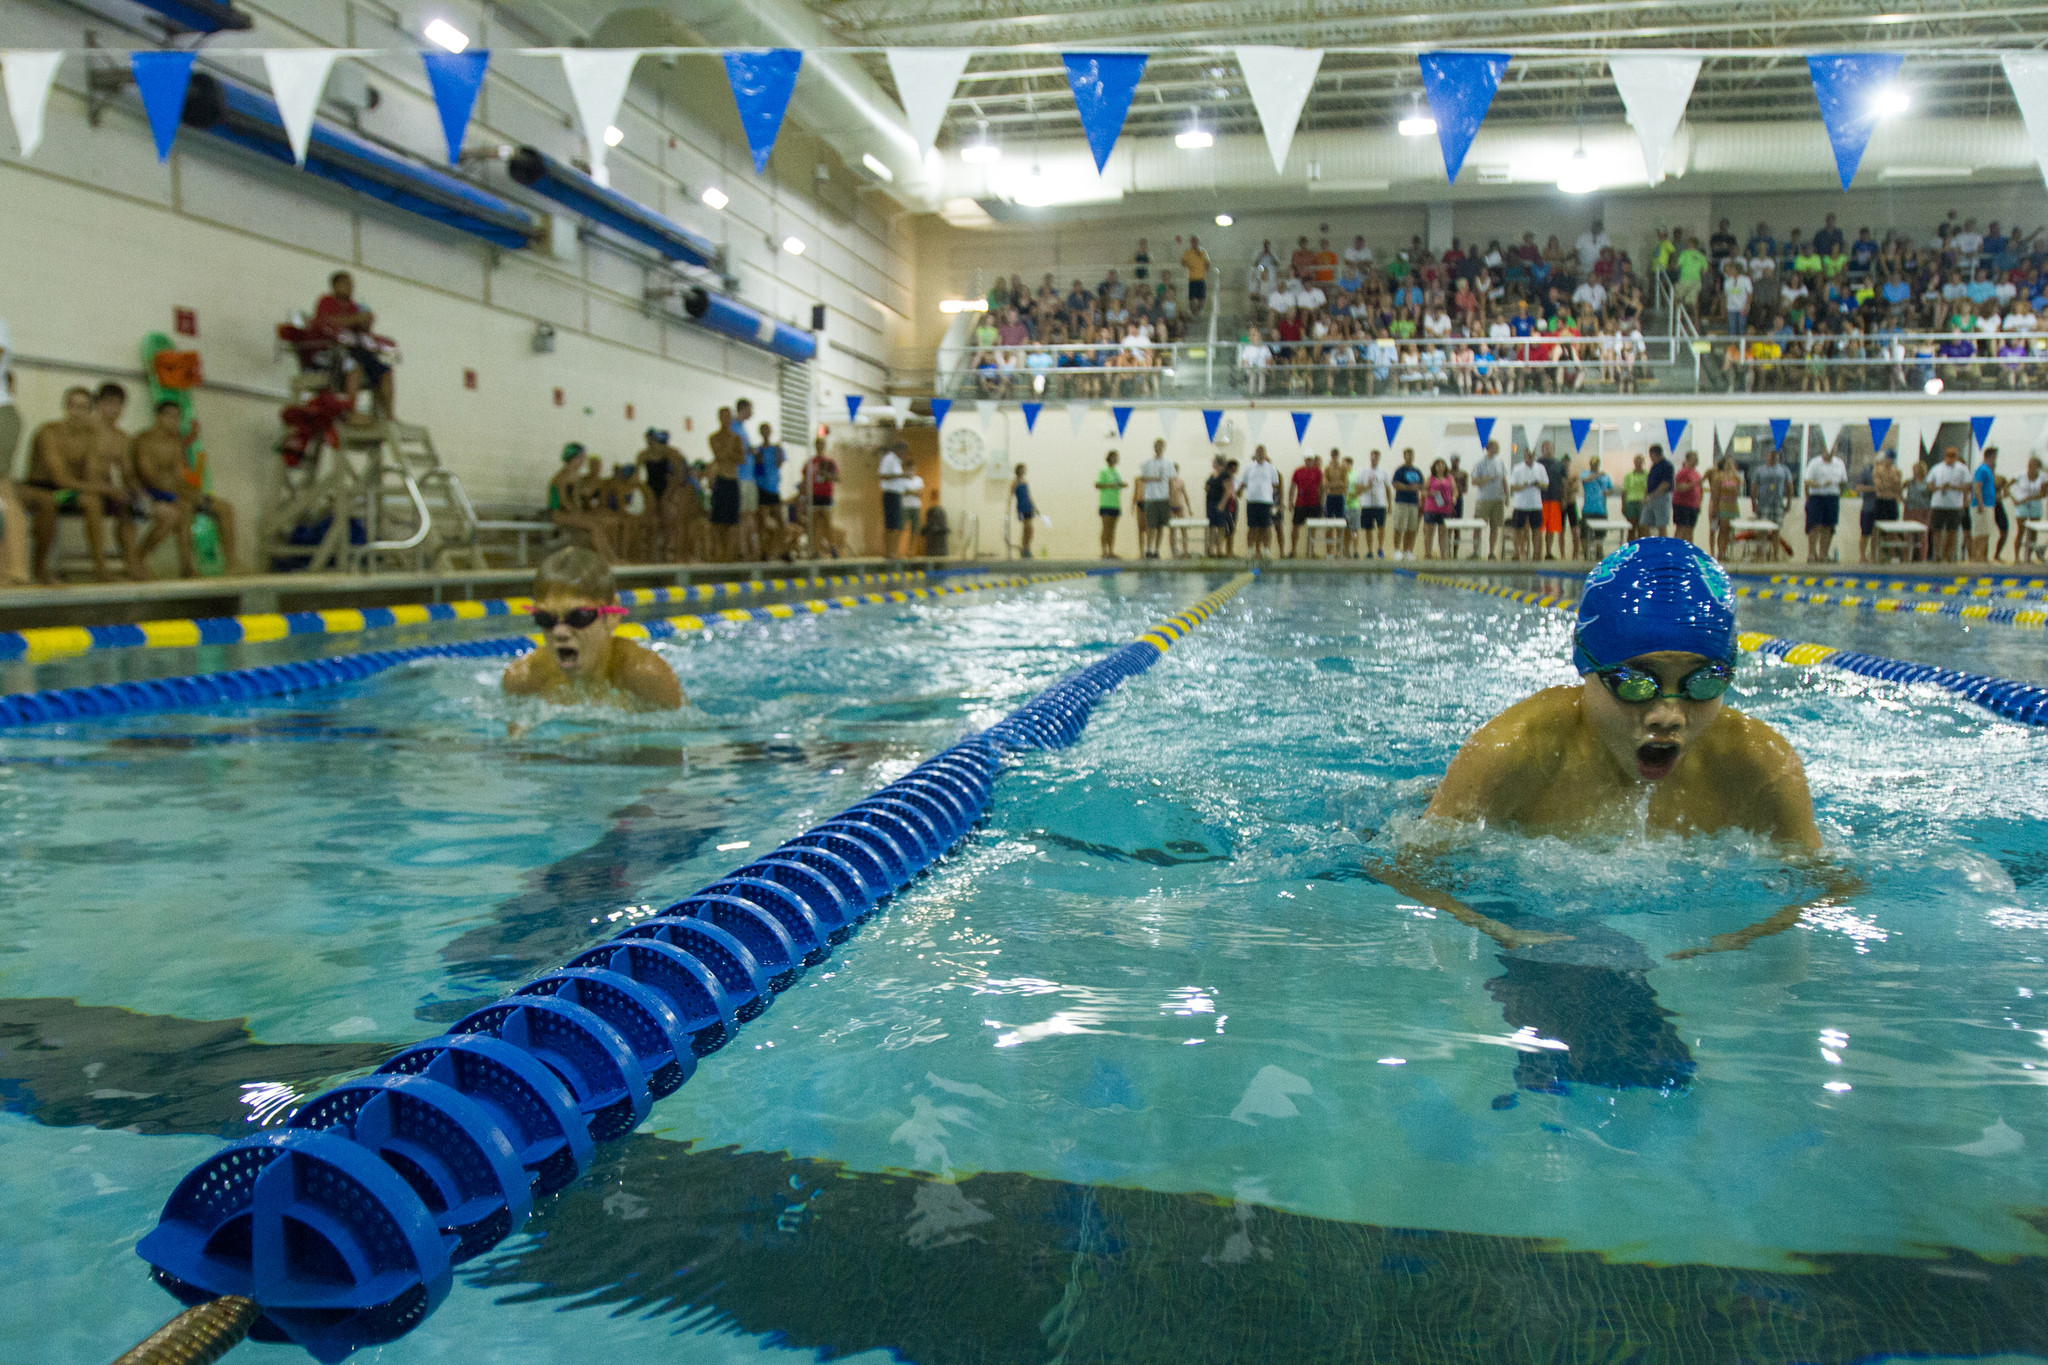 kecoughtan invitational swim meet 2015